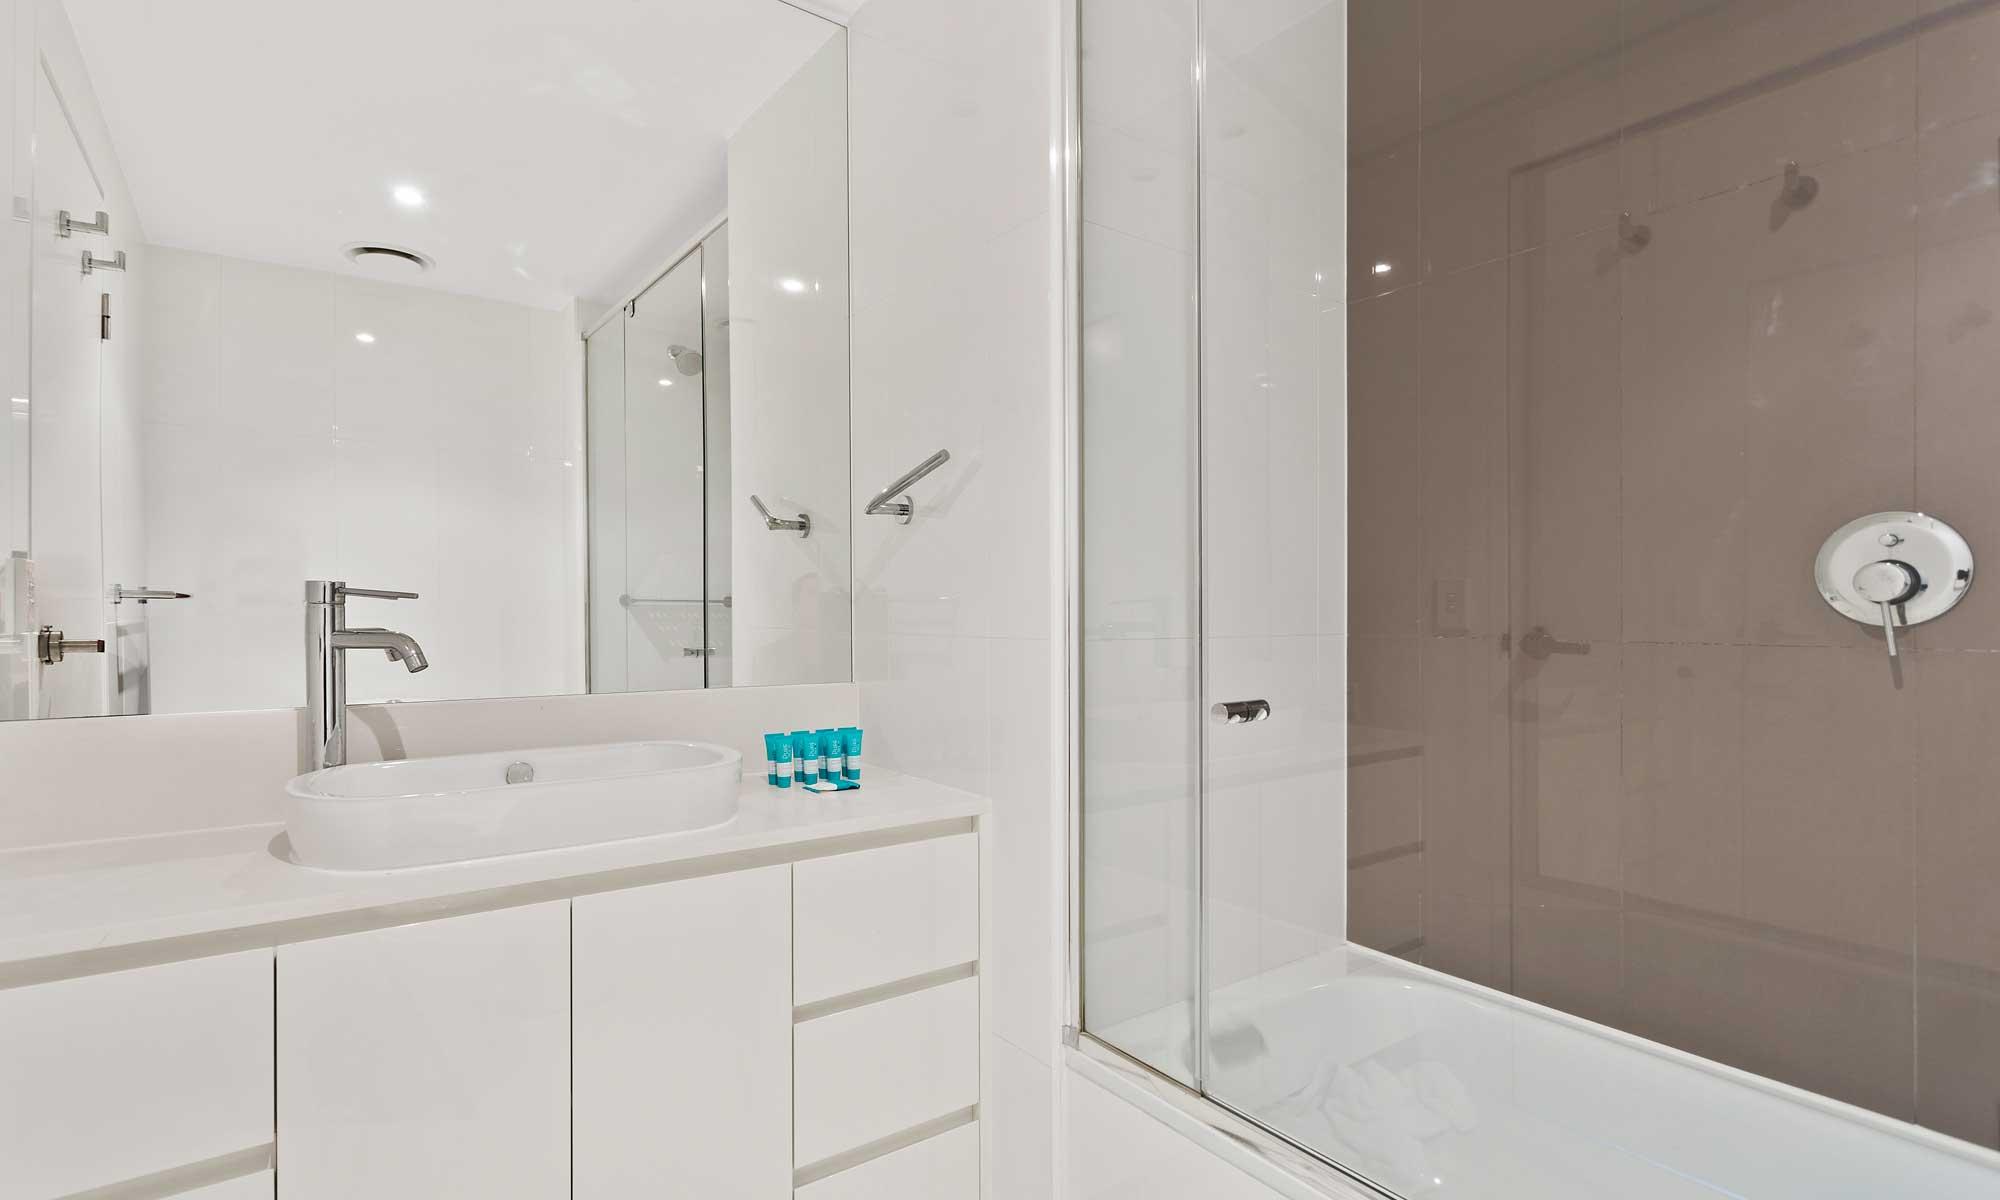 Gold Coast real estate for sale Hilton 22706 in H Residences above Hilton Surfers Paradise ensuite